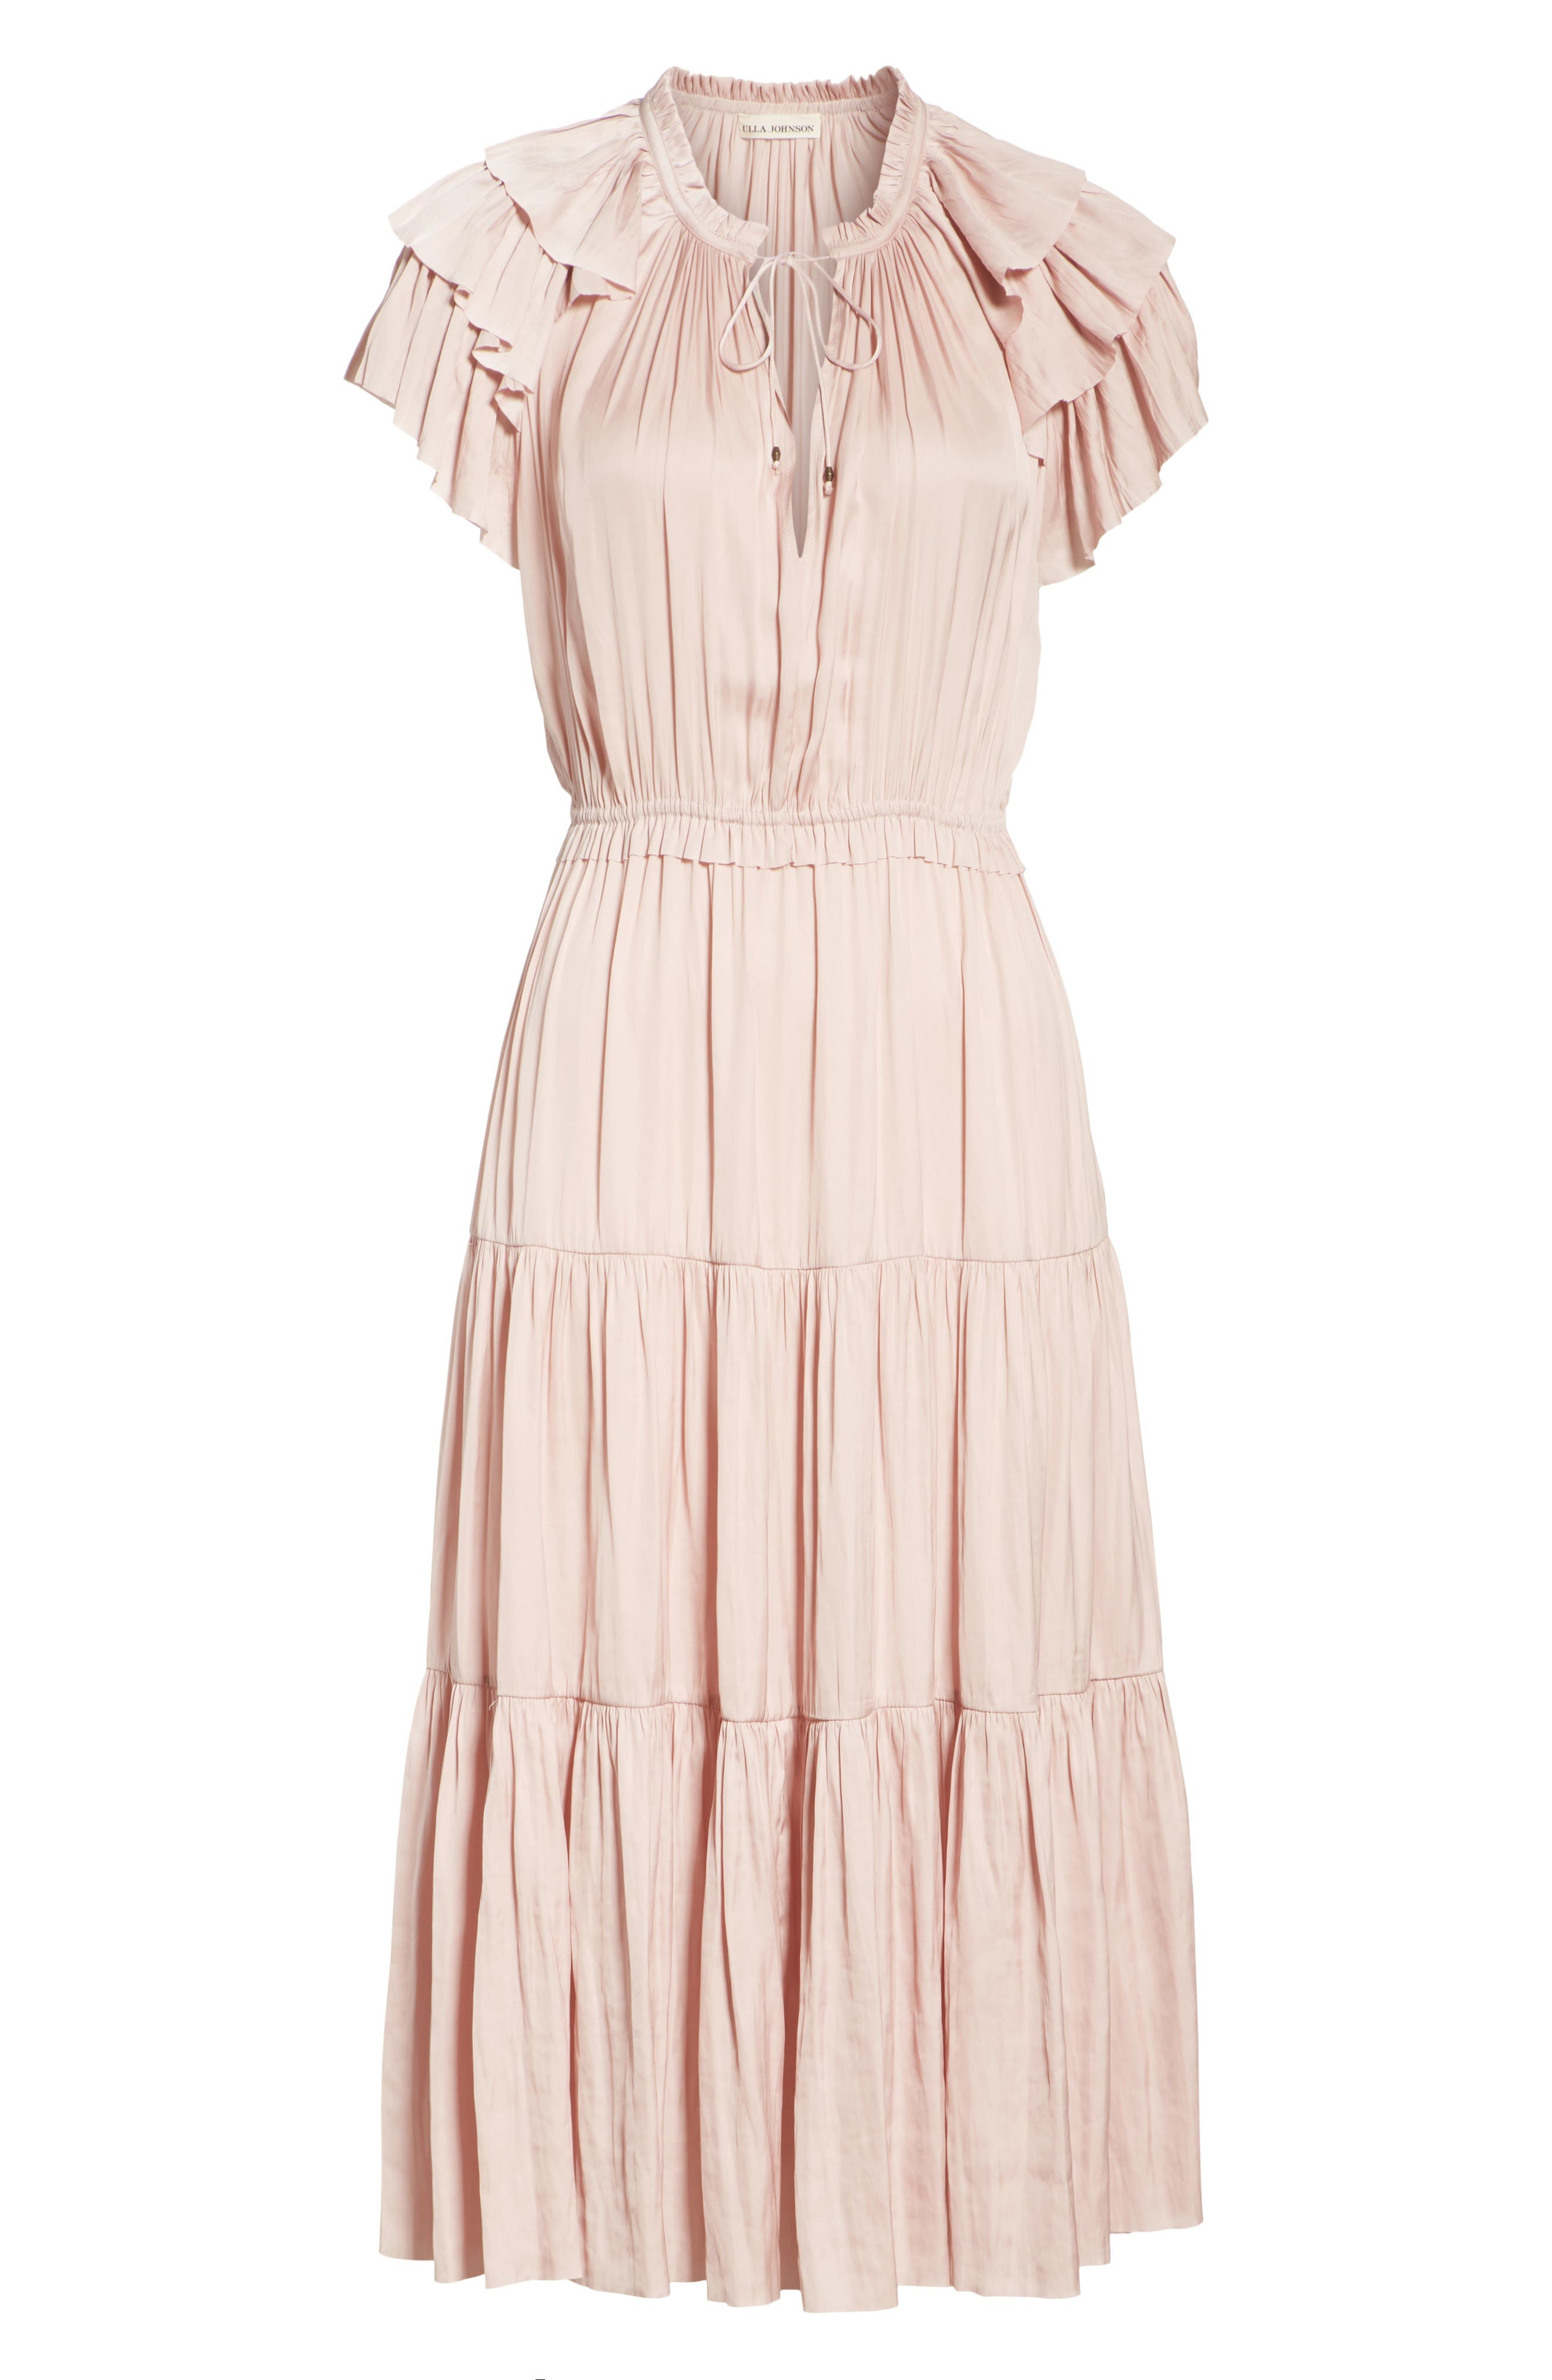 Blaire Satin Dress,                             Alternate thumbnail 6, color,                             Rose